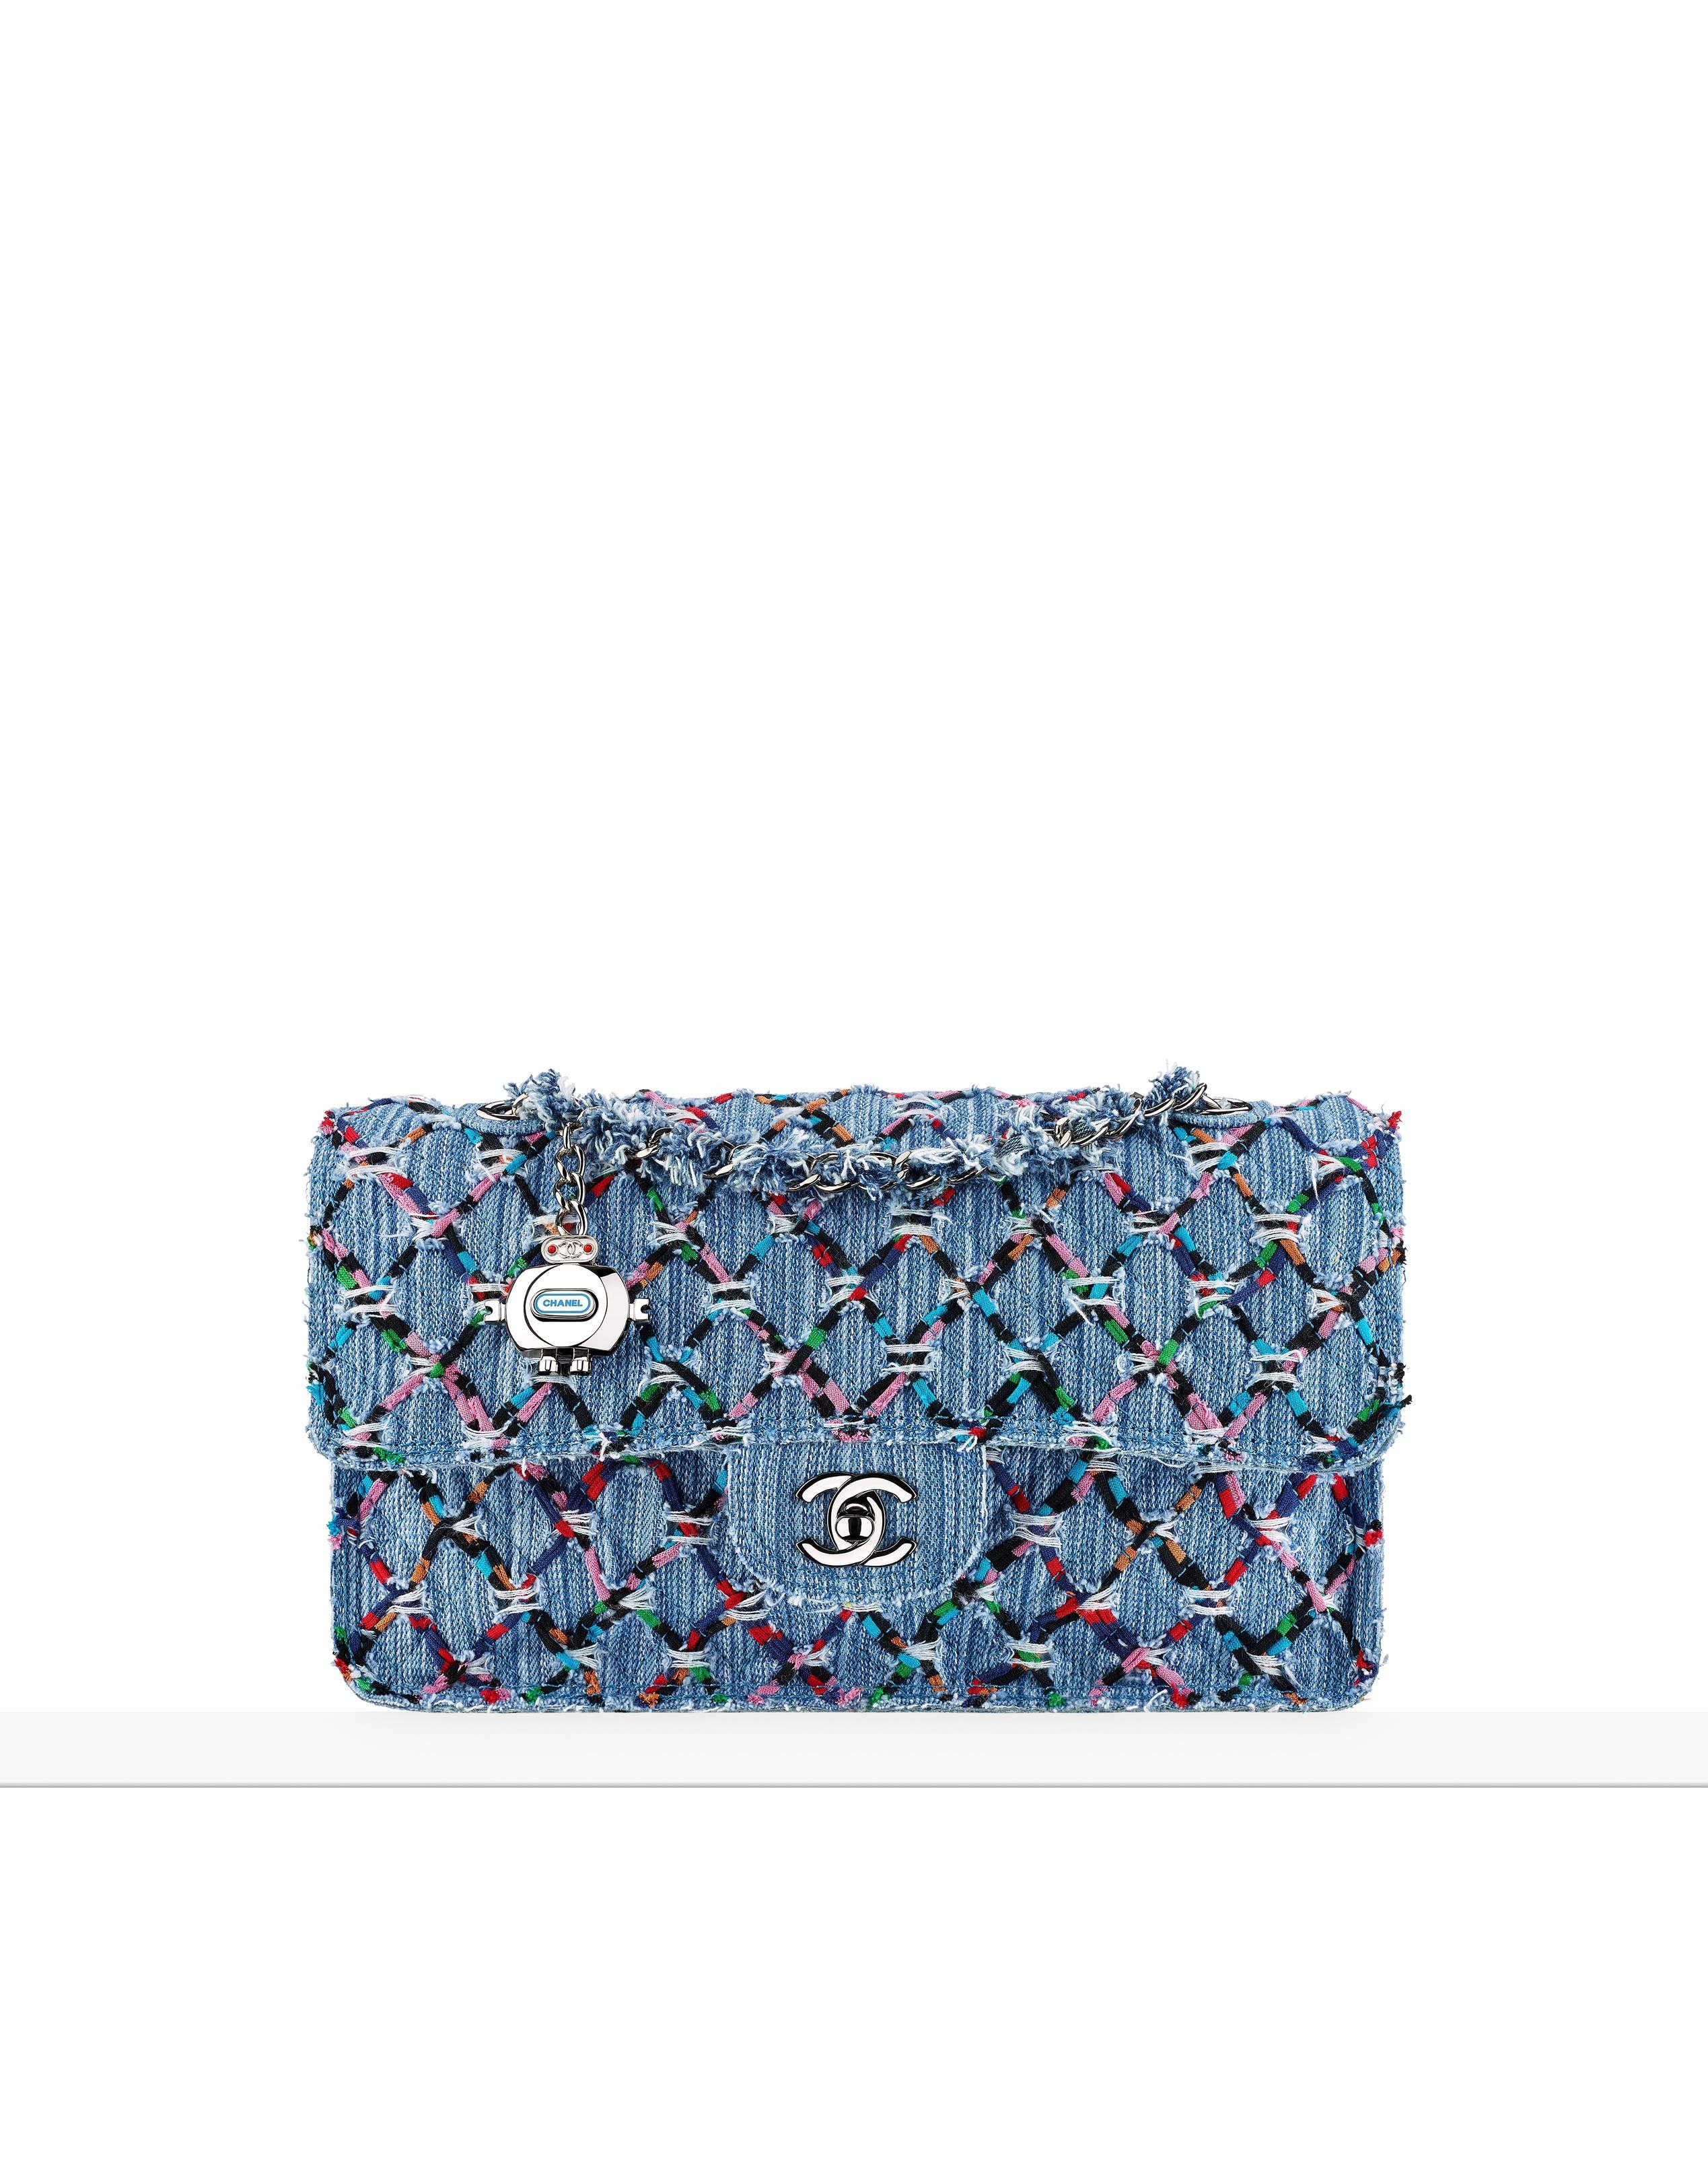 a07d4da99825 Spring-Summer 2017 - woven denim tweed bag chanel   Chanel in 2019 ...